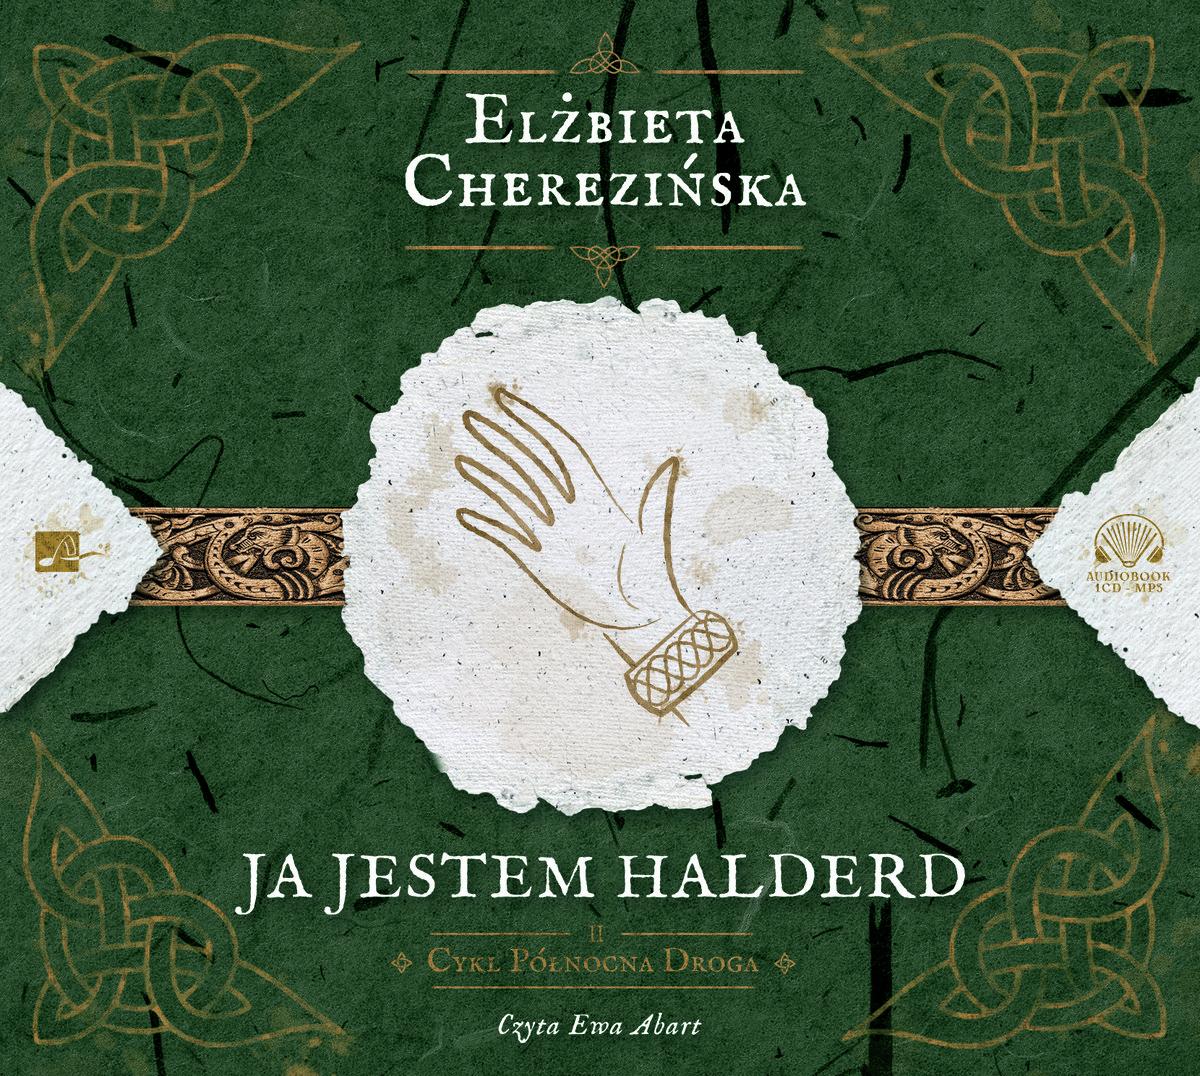 Cherezińska Elżbieta – Ja Jestem Halderd